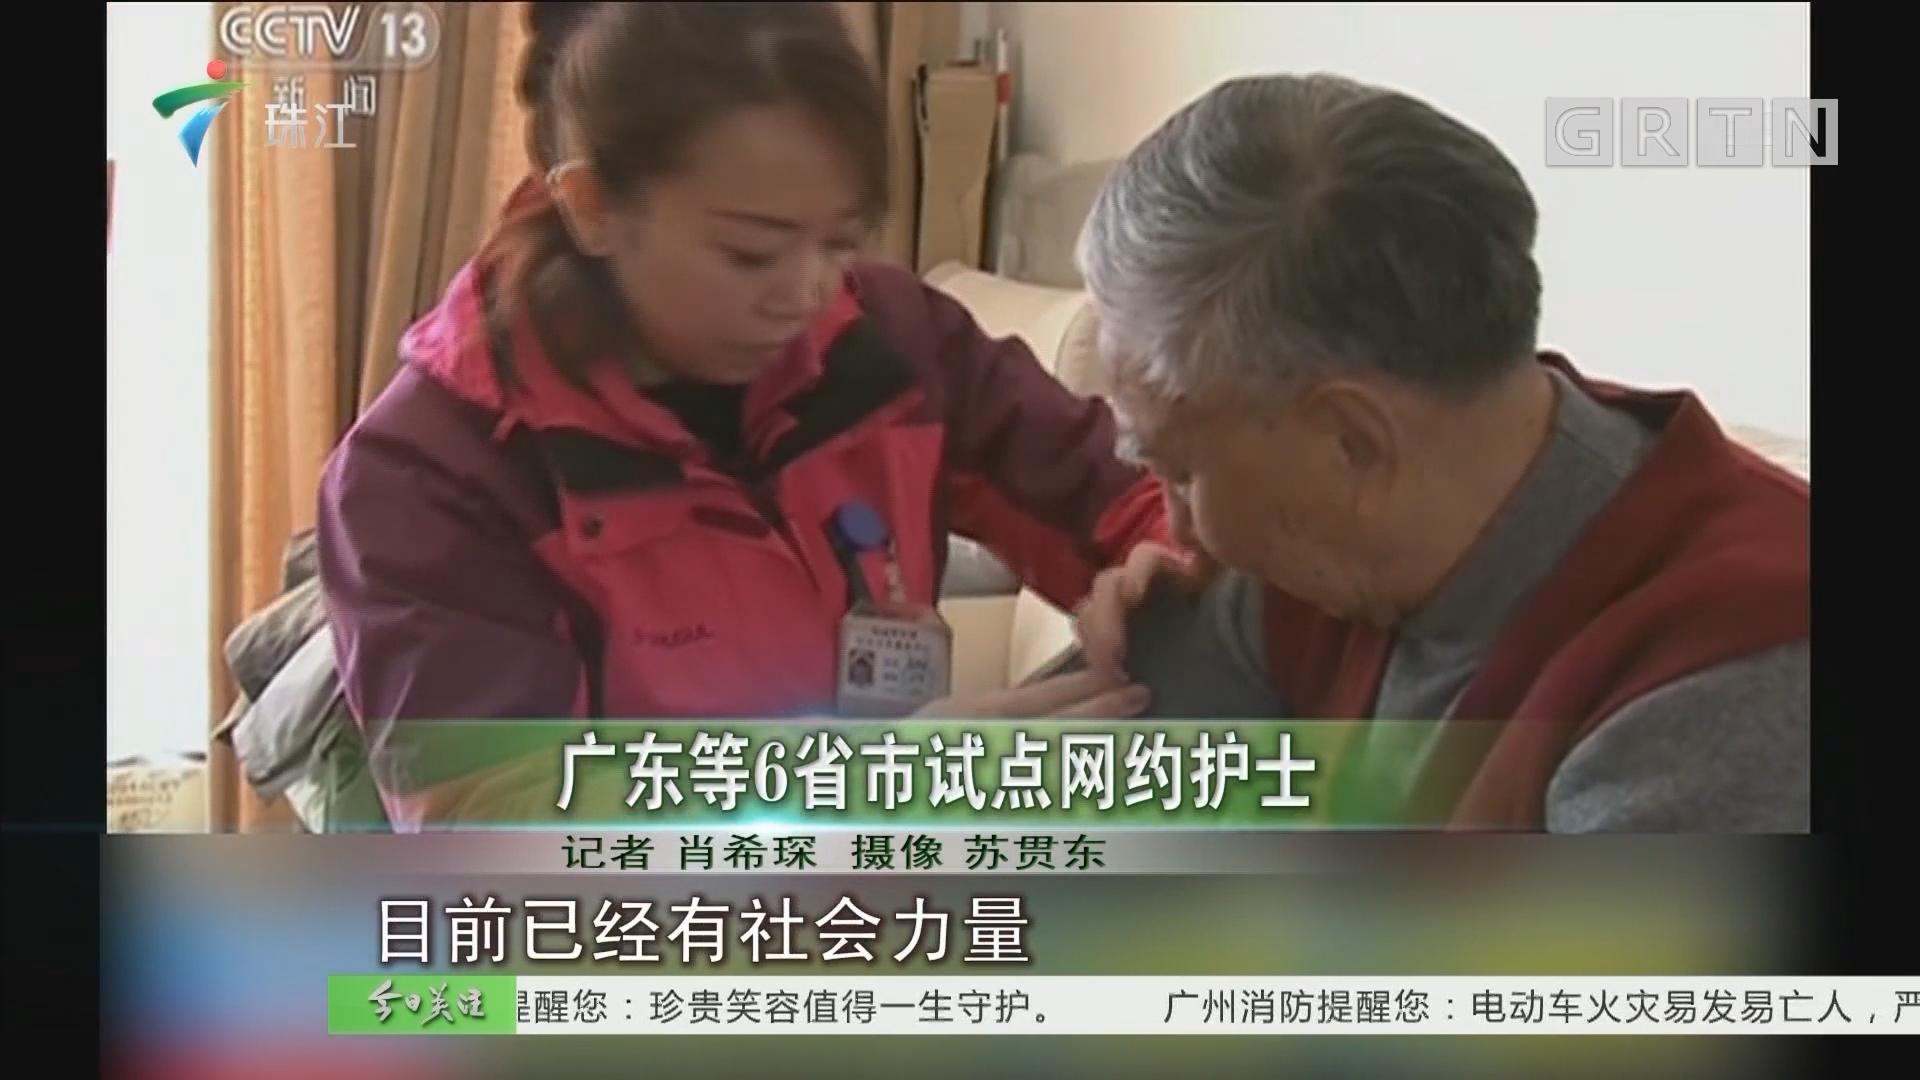 manbetx手机版 - 登陆等6省市试点网约护士